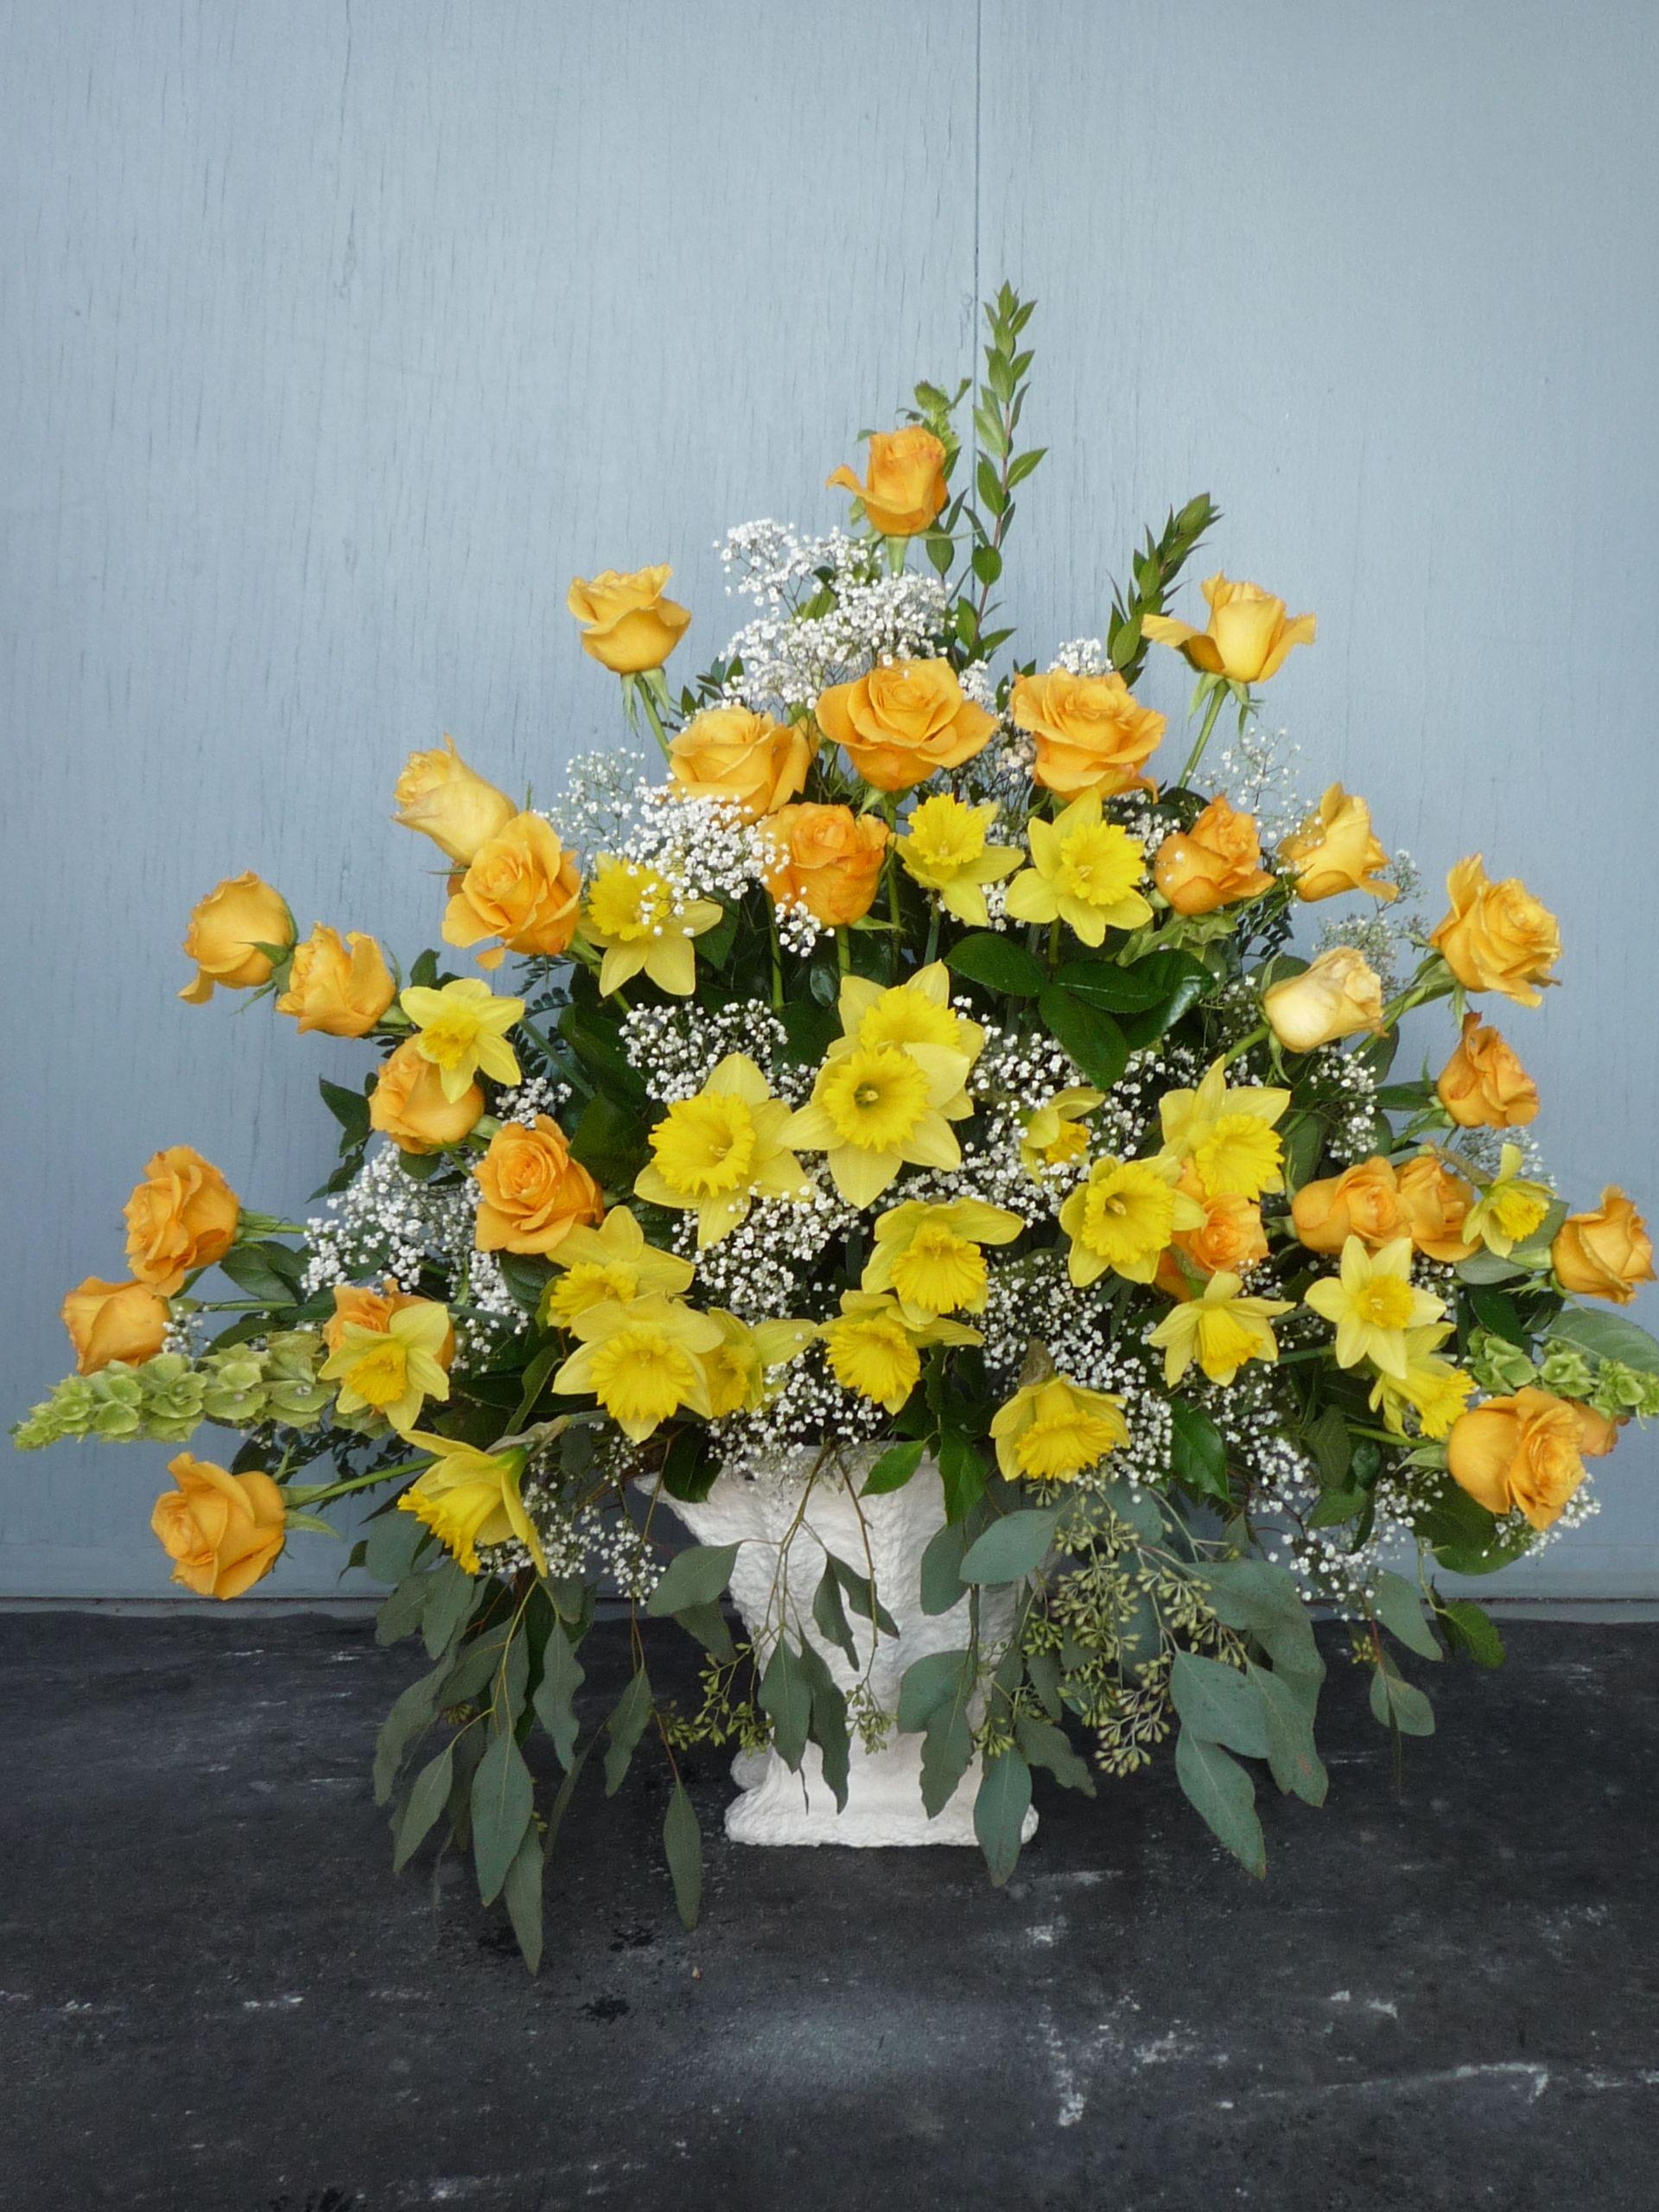 Large Yellow Rose And Daffodil Sympathy Arrangement In Memorial